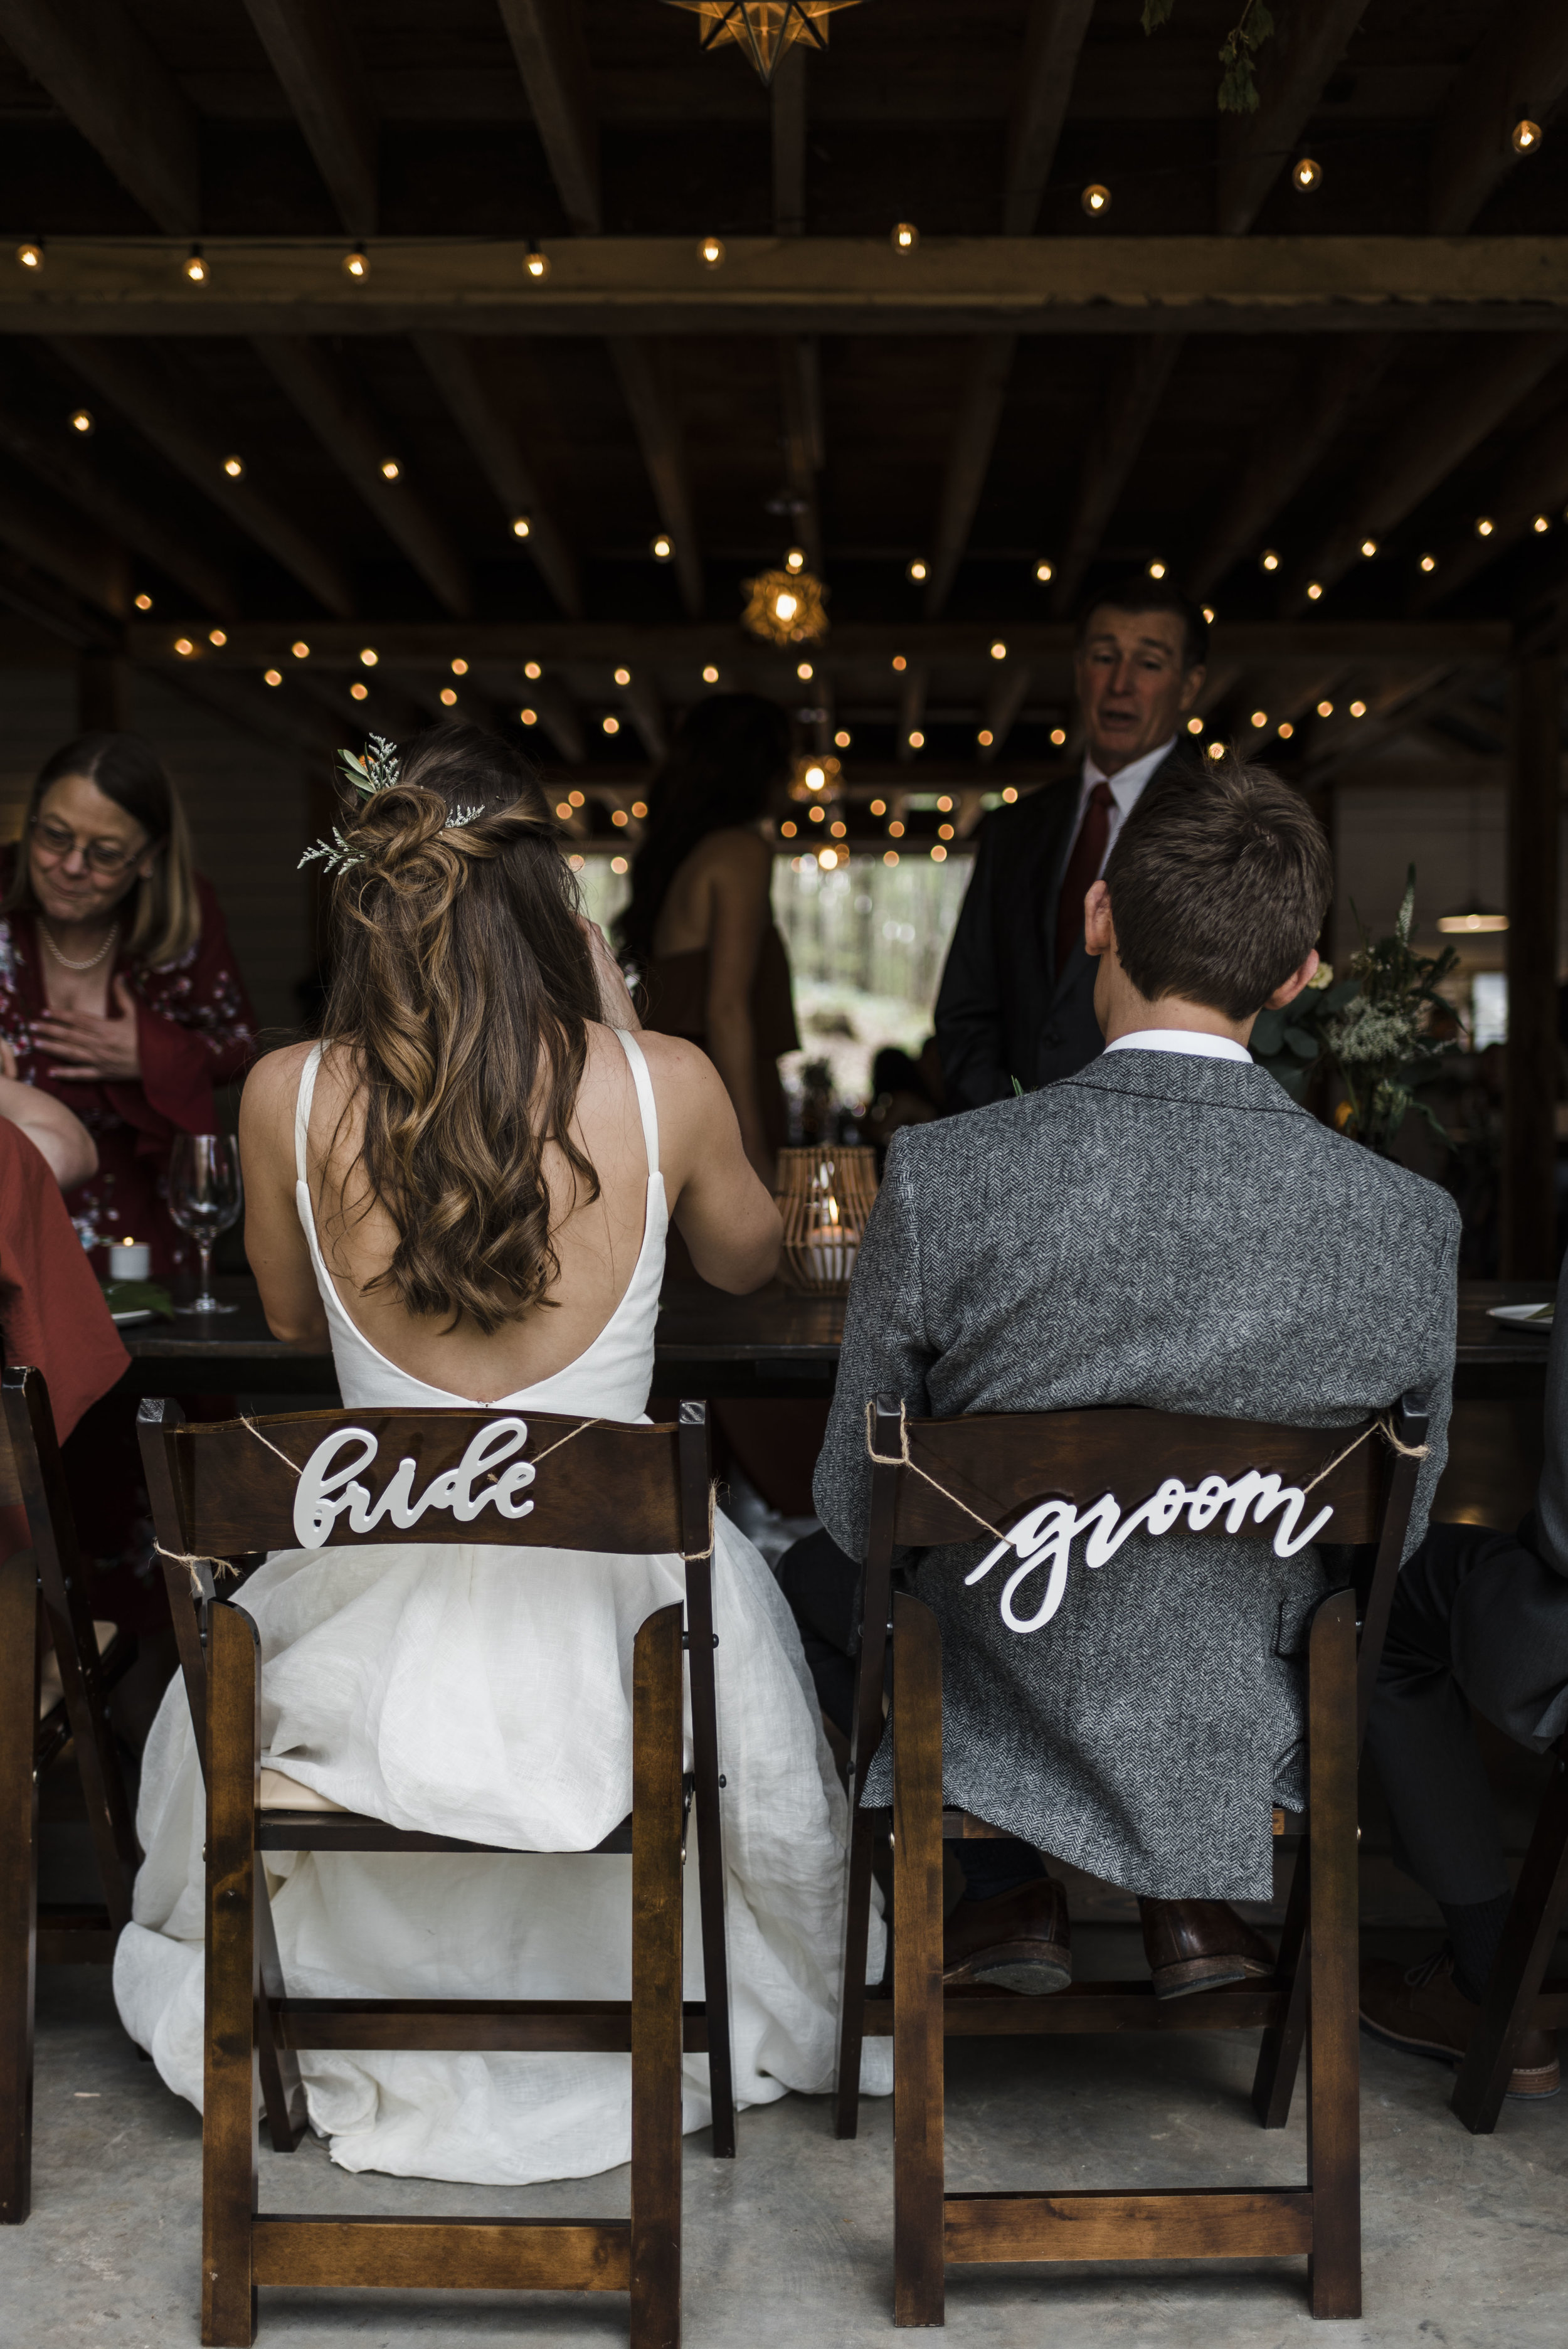 wedding bride groom chairs reception chattanooga Tennessee barn